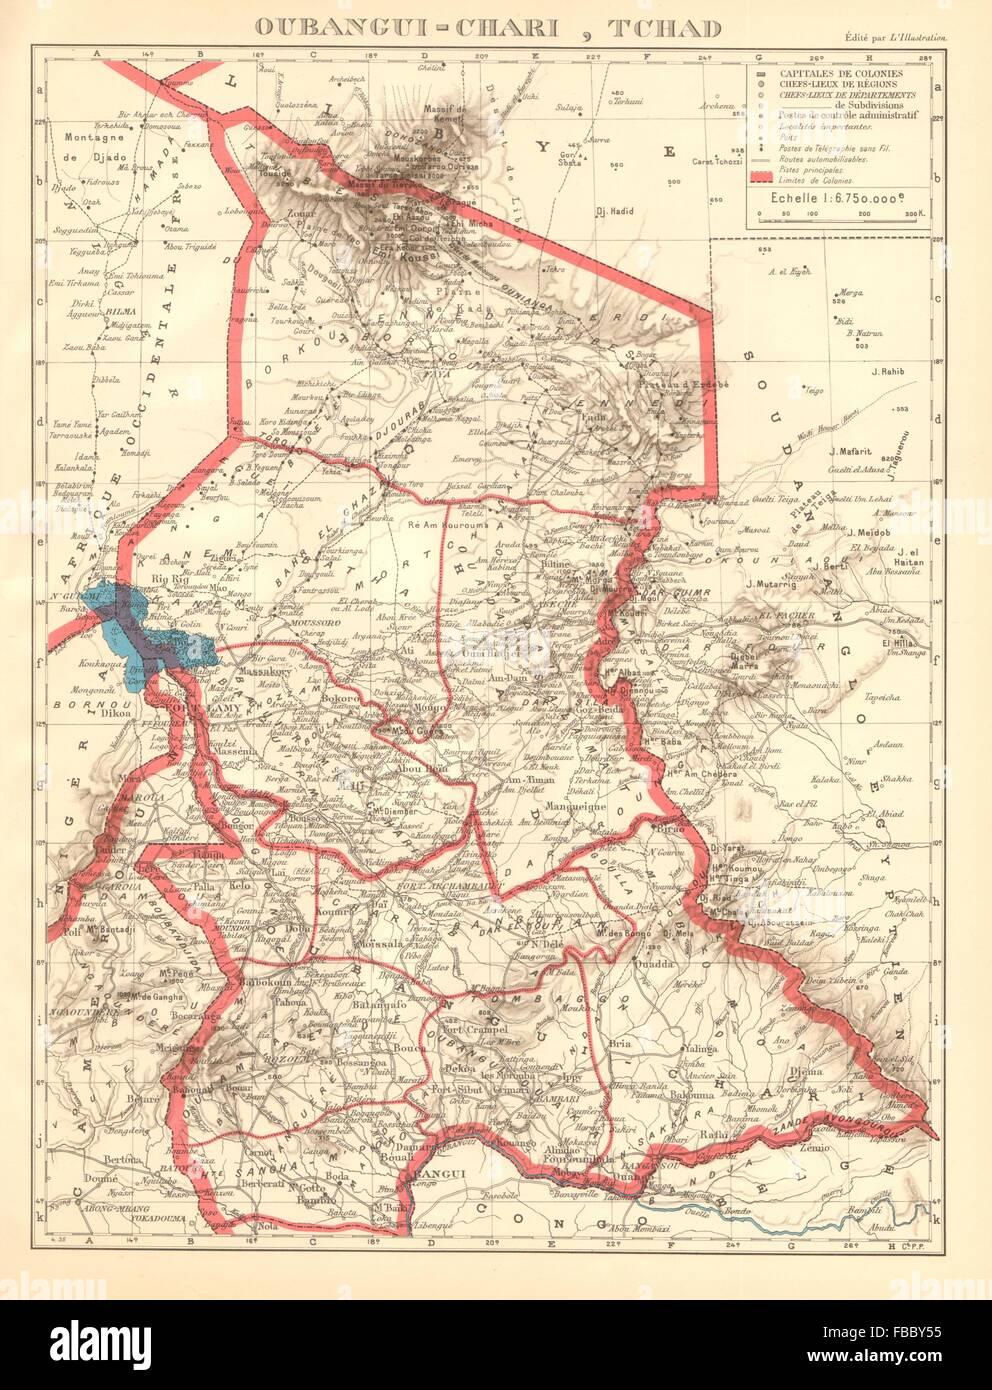 FRENCH COLONIAL CHAD & UBANGI-SHARI (C.A.R.). Oubangui-Chari Tchad, 1938 map - Stock Image